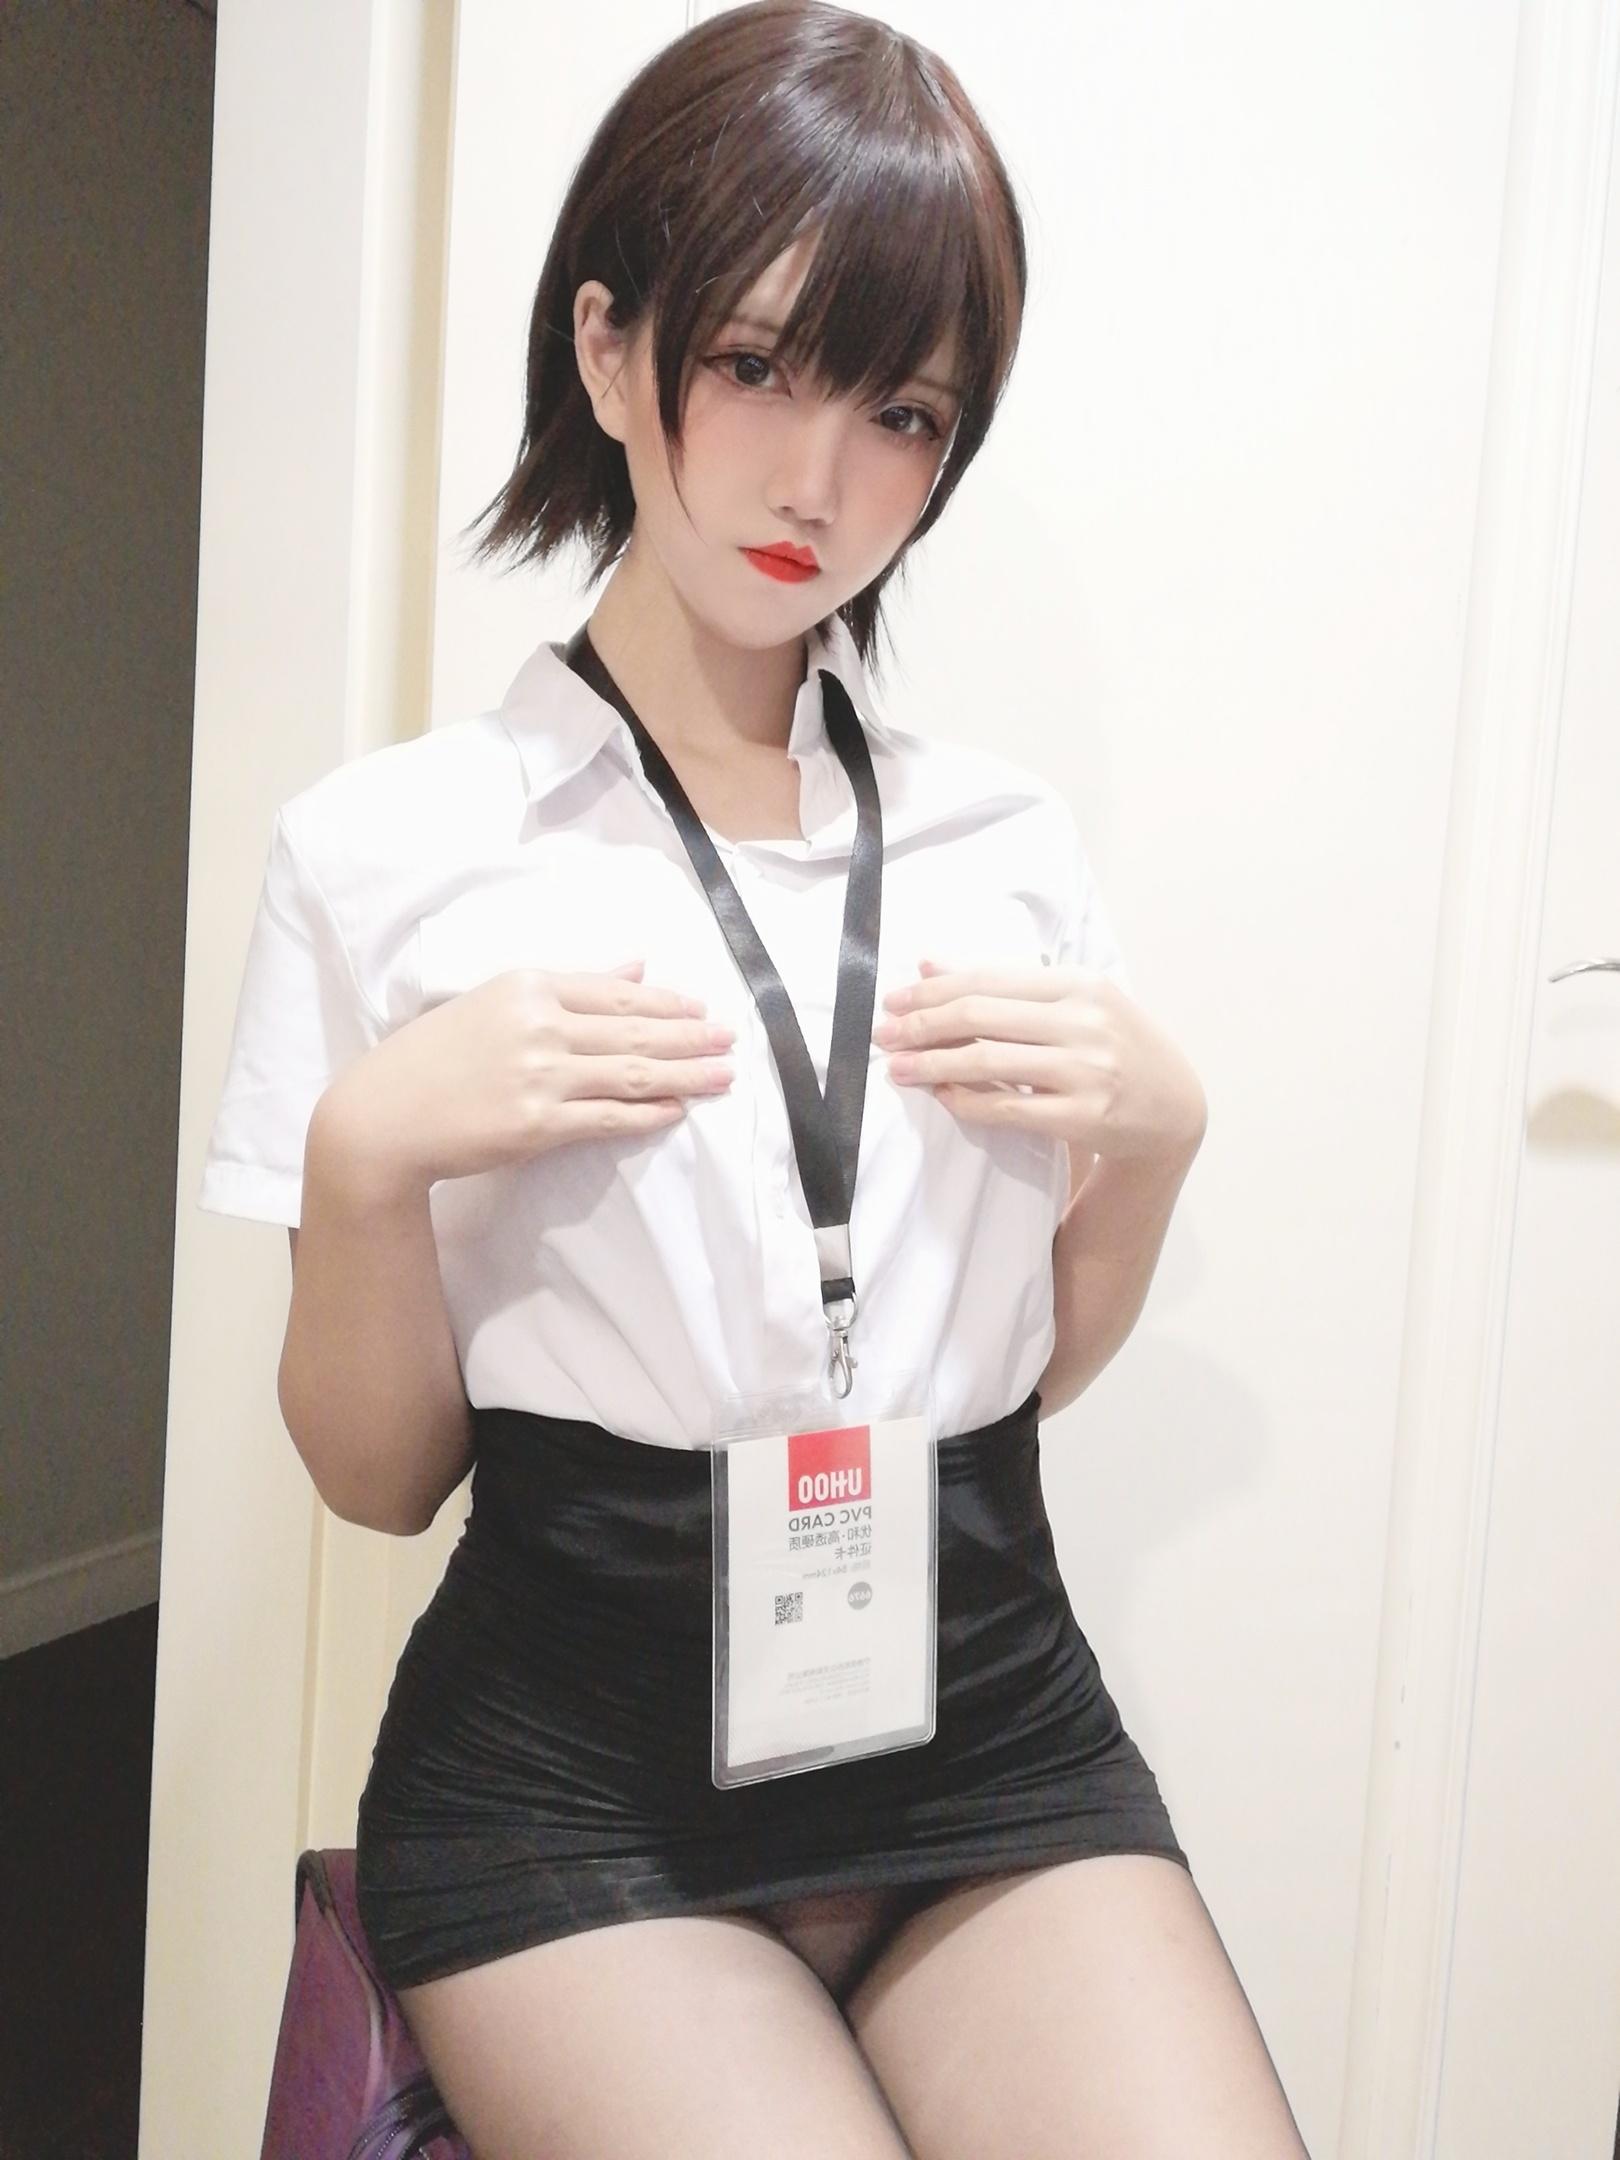 宅男咪zhainanmi.net; (41)